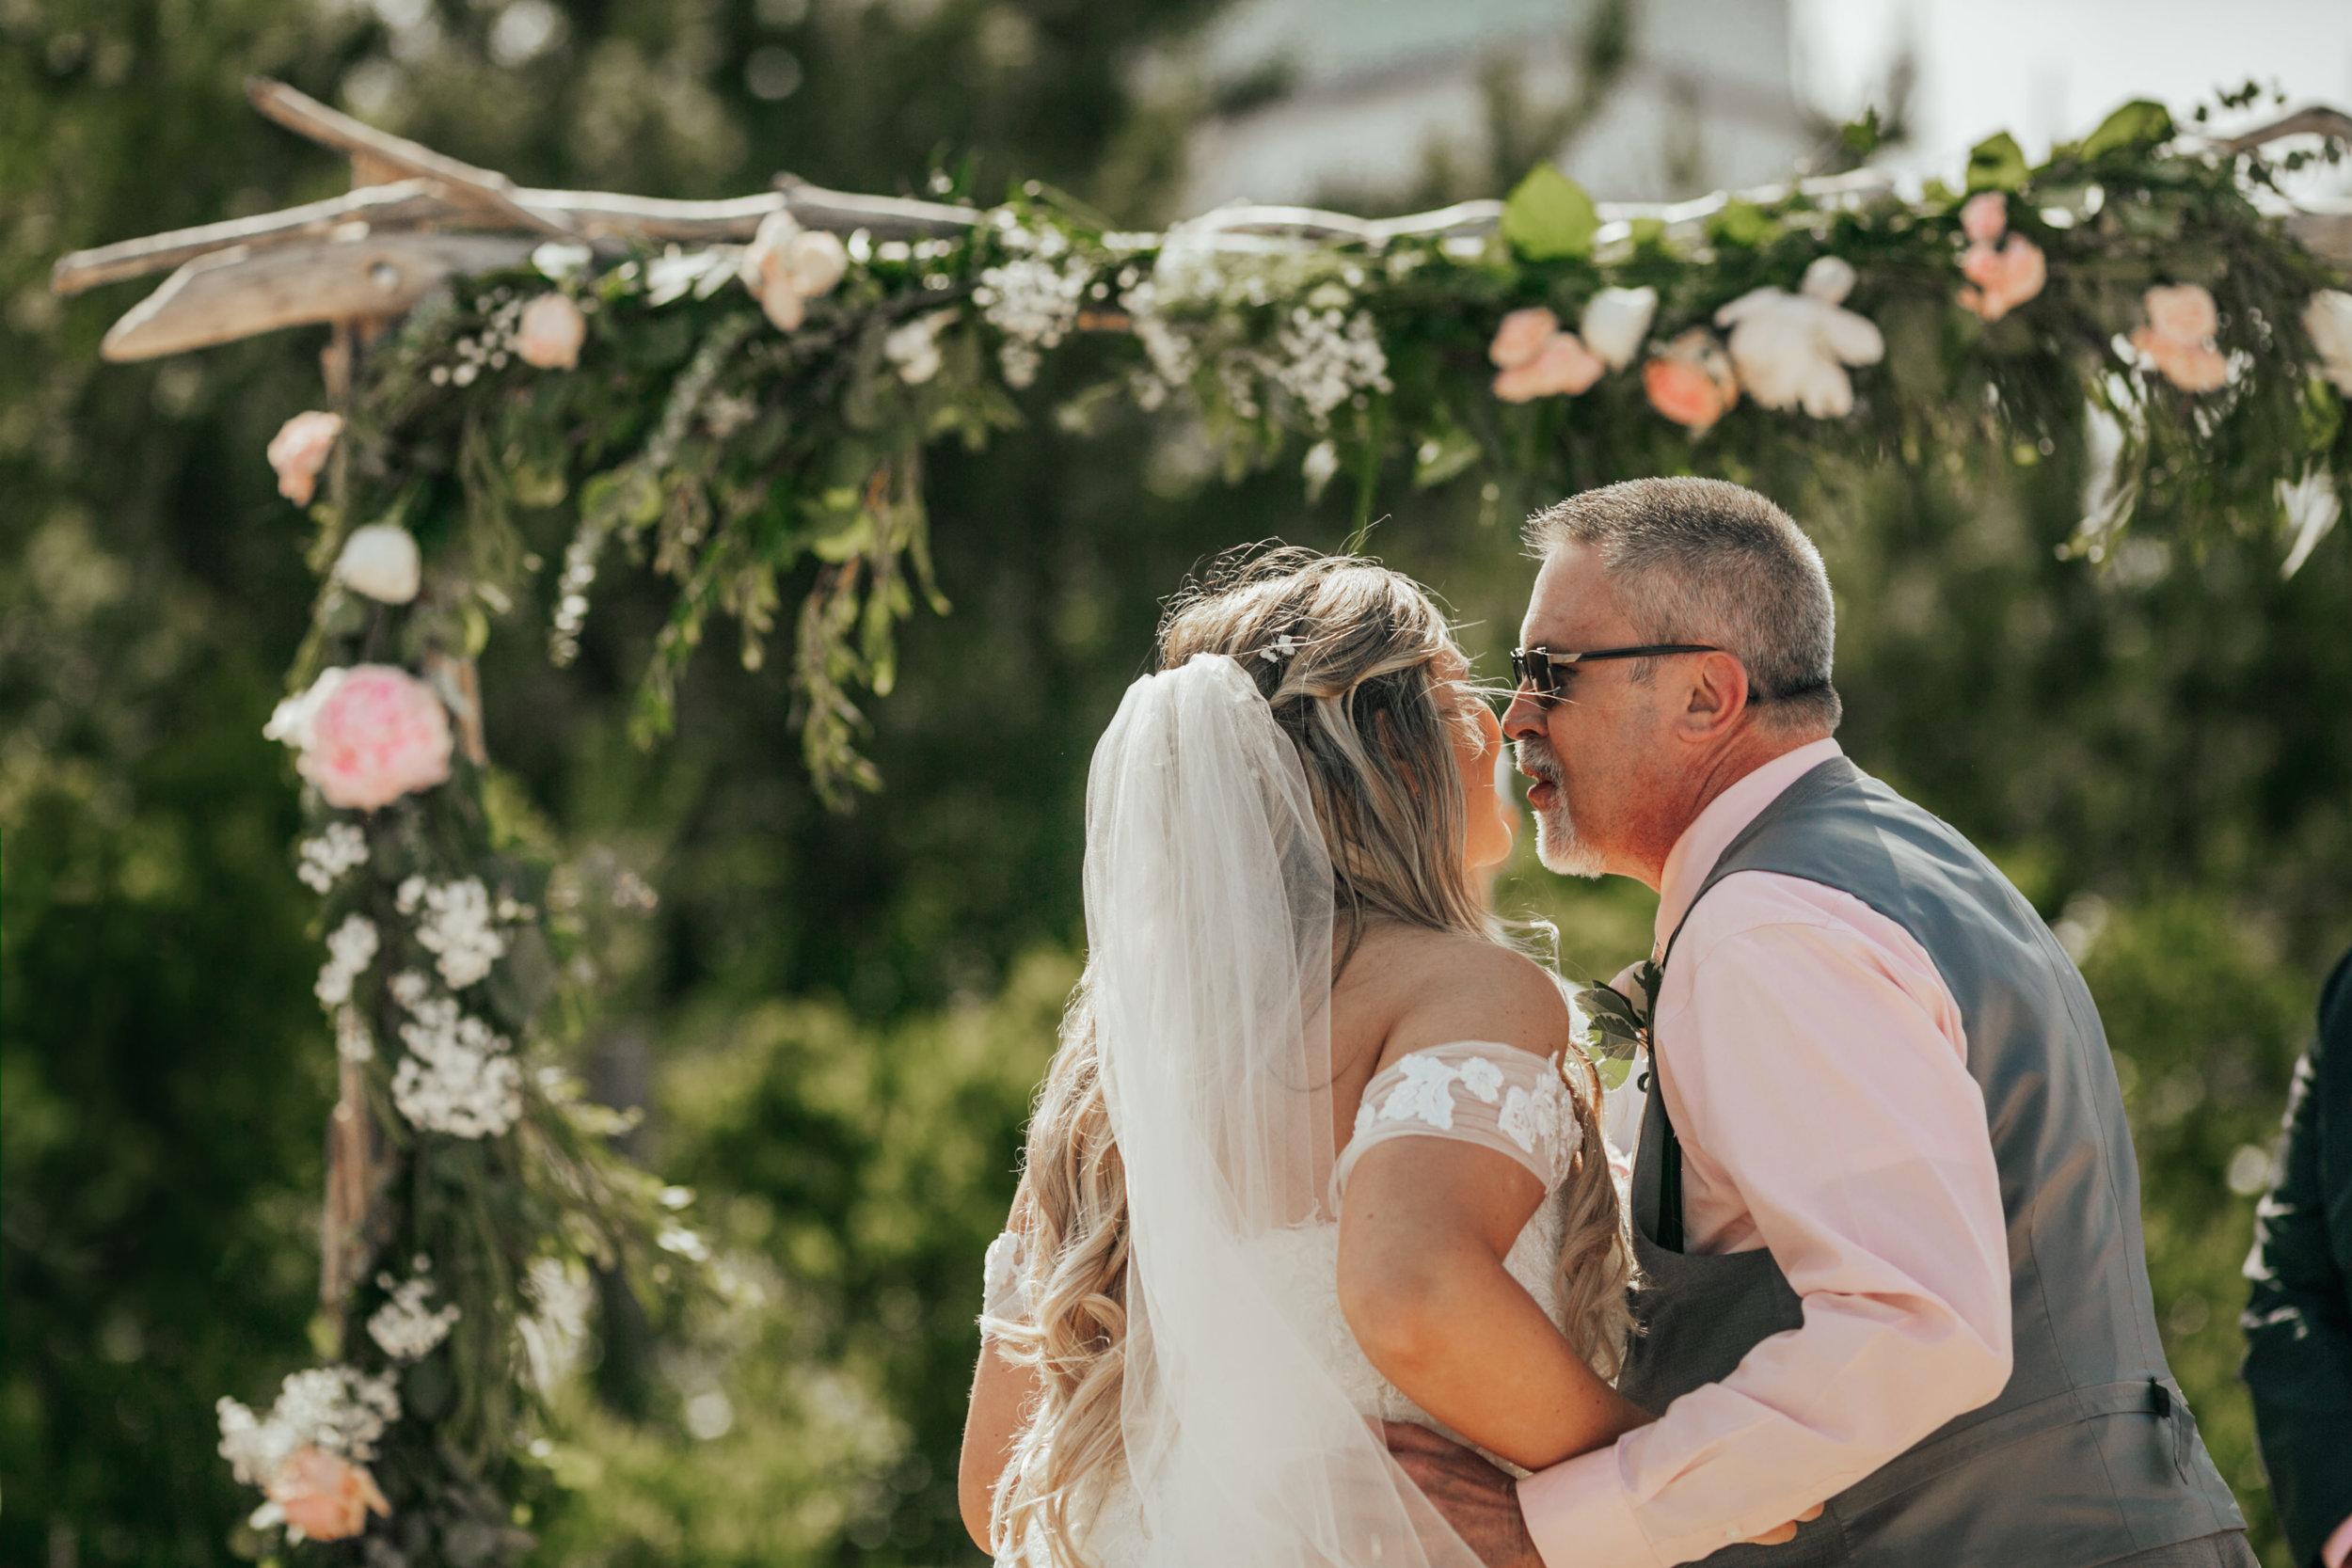 New Jersey Wedding Photographer, Felsberg Photography LBI wedding photography 65.jpg